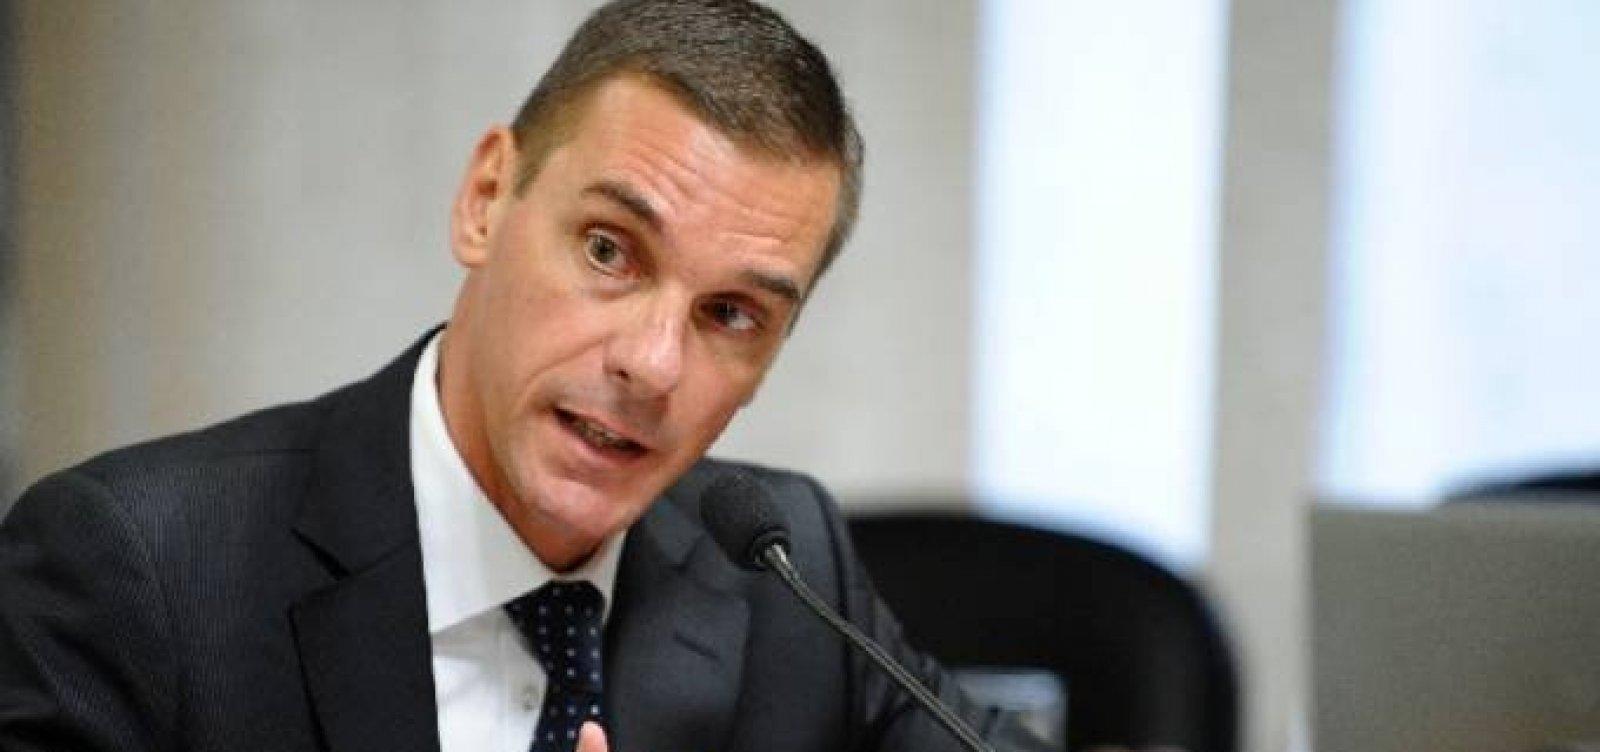 Bolsonaro pediu a Guedes demissão do presidente do BB, informa Planalto